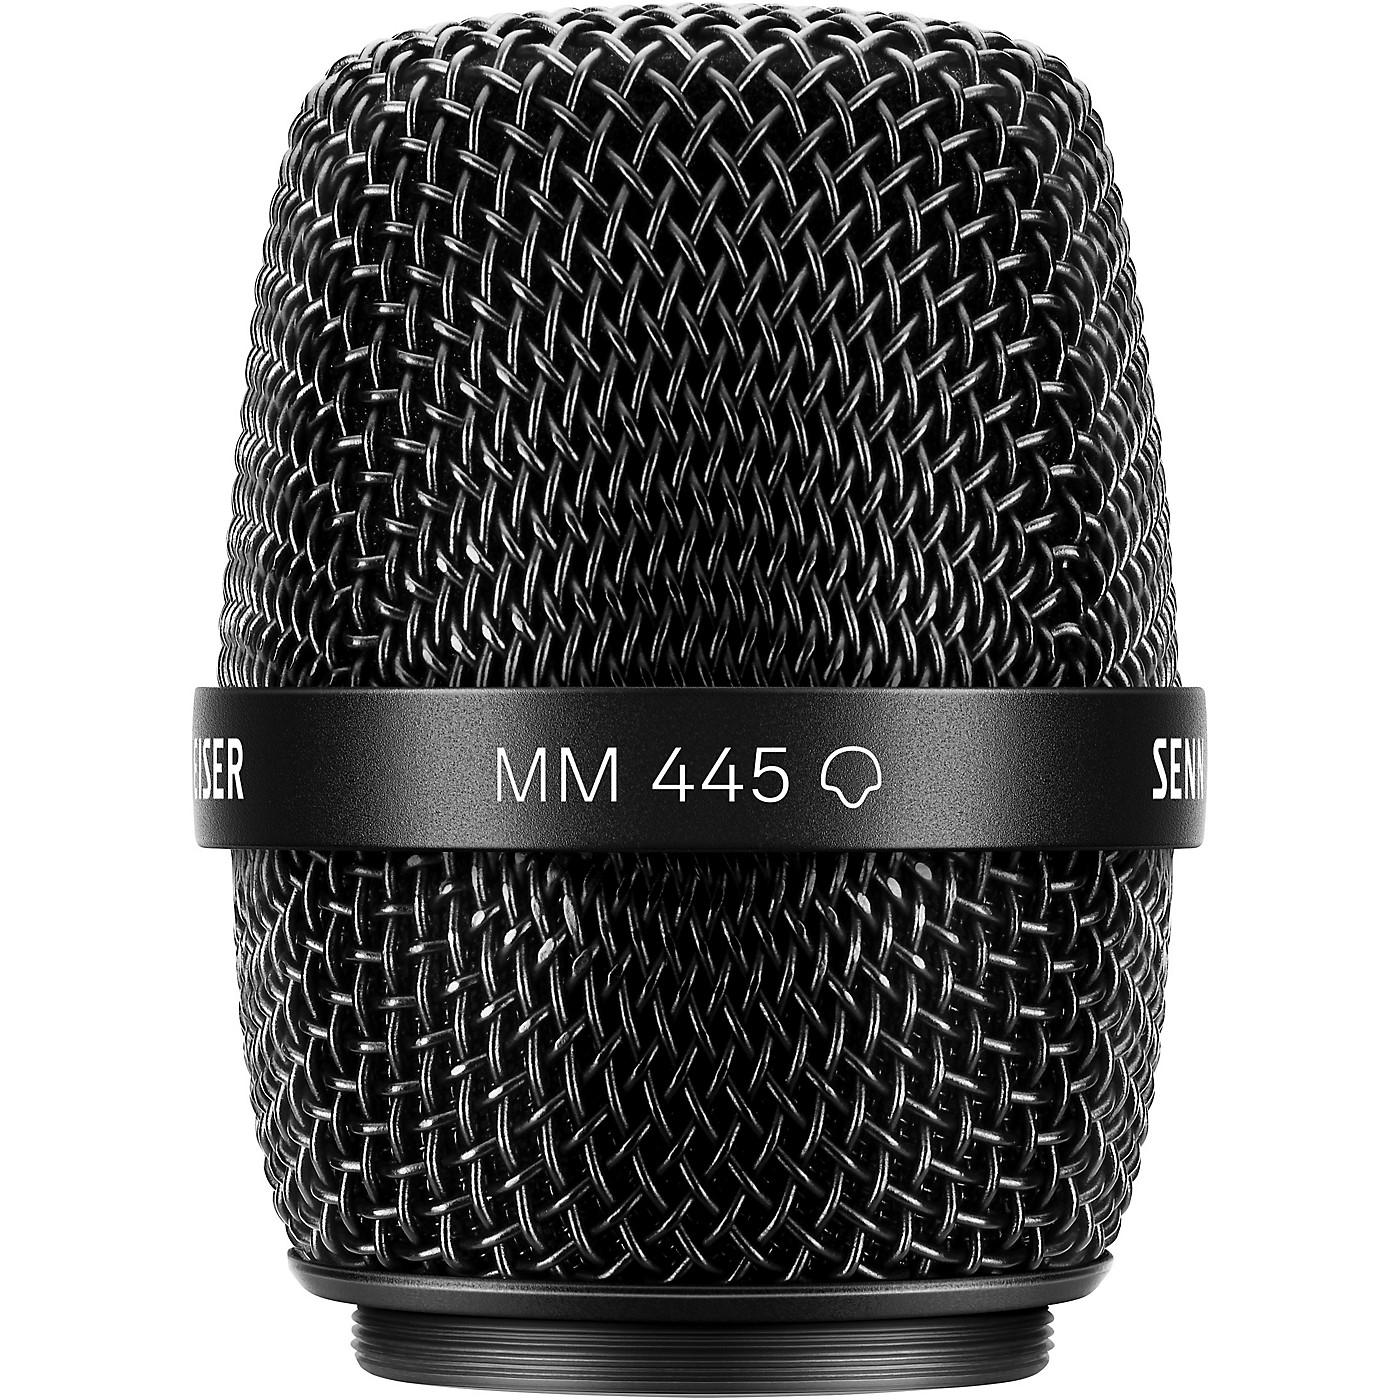 Sennheiser MM 445 Dynamic Microphone Capsule thumbnail